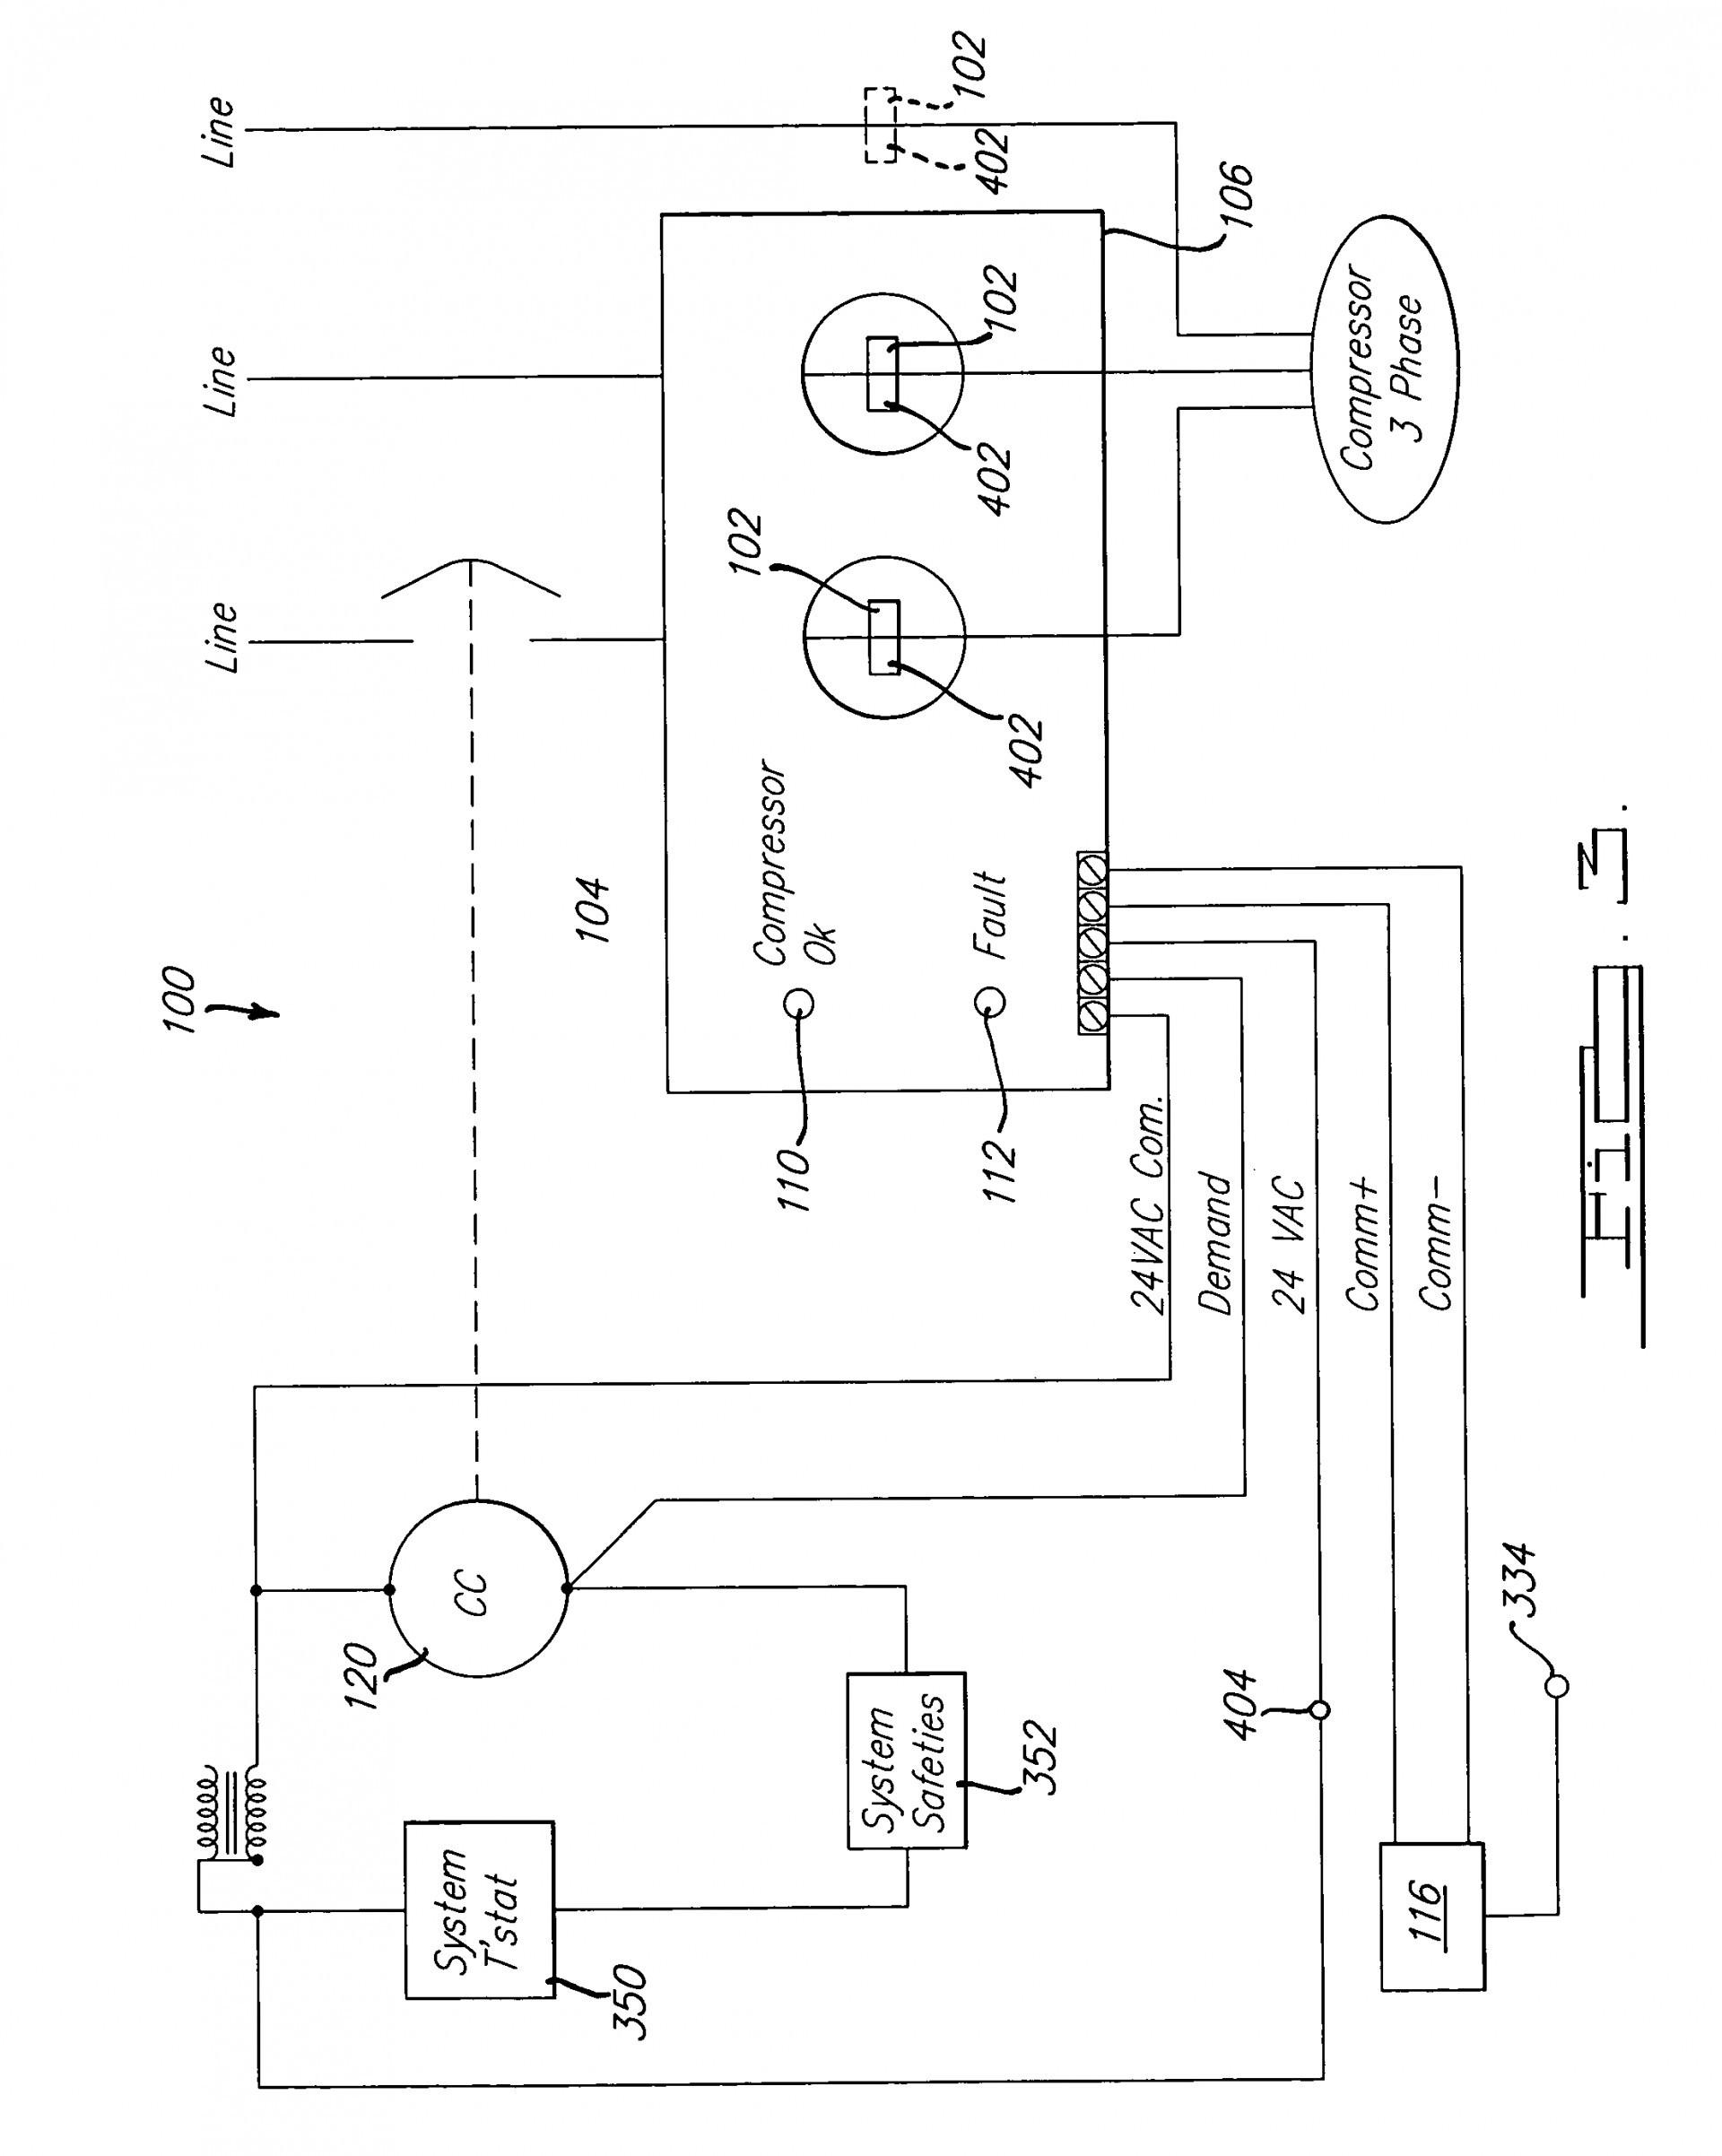 pressor Wiring Diagram Single Phase Lovely Copeland Pressor For